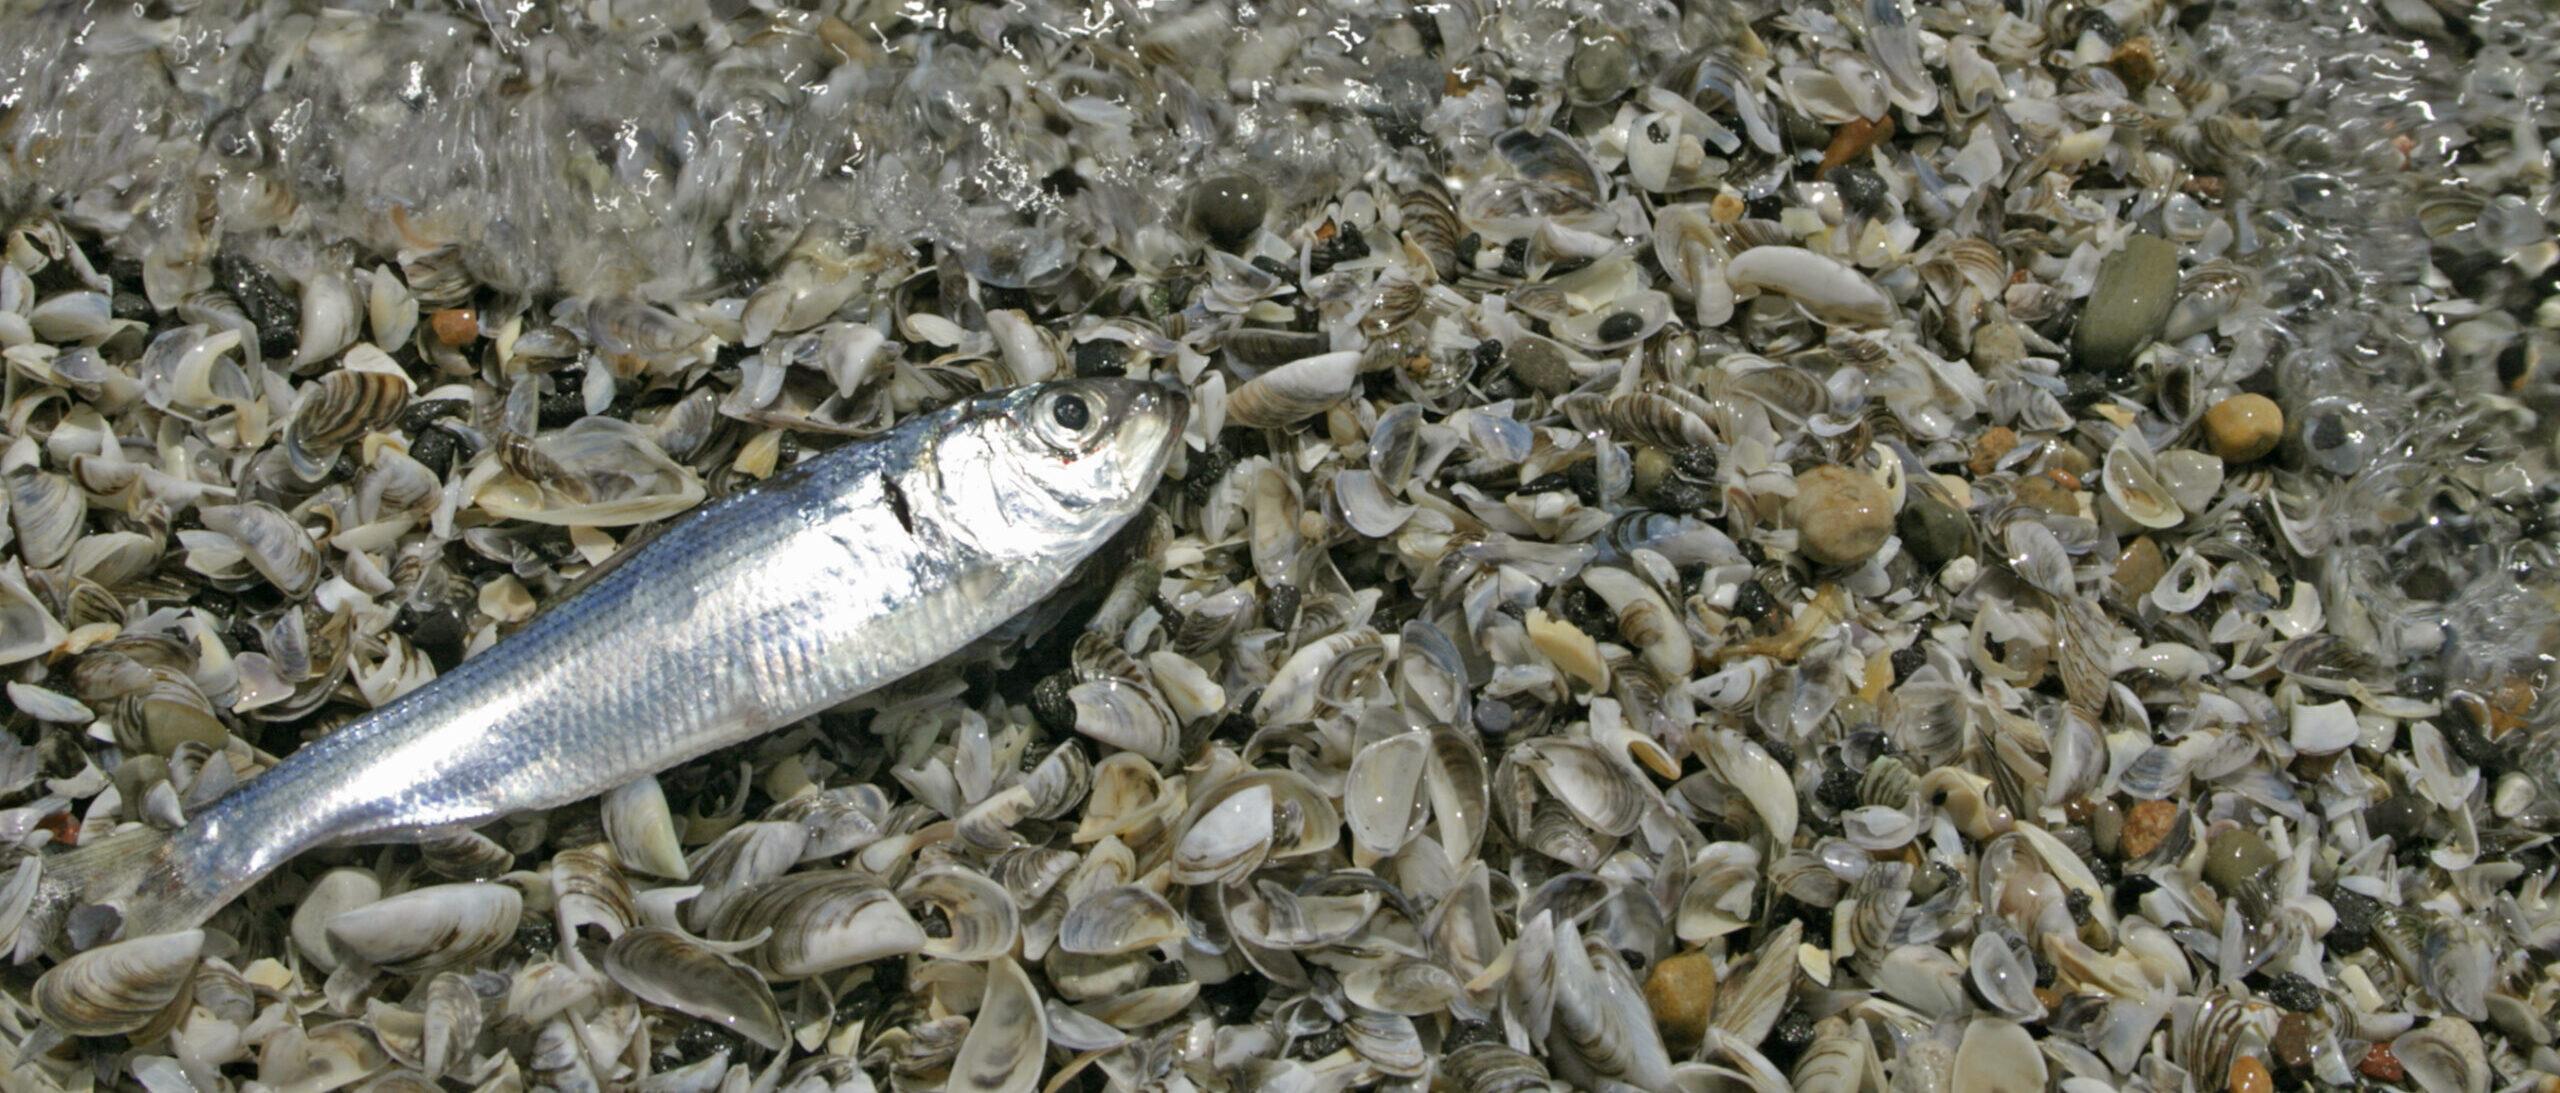 fish on beach